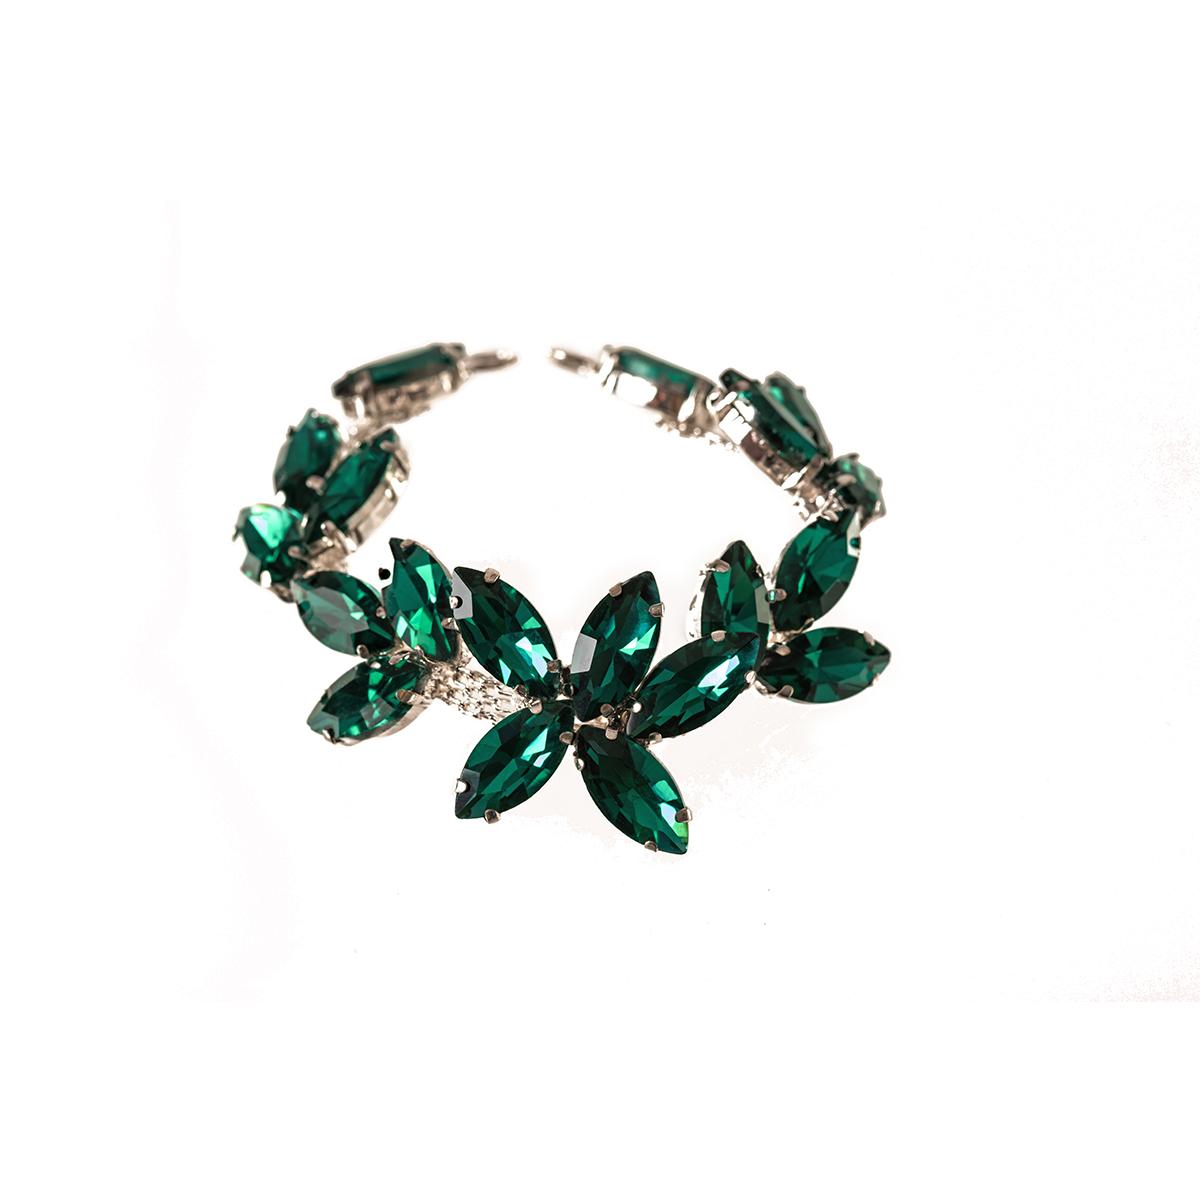 Rhinestone-Diamante-Motif-Applique-Sew-on-Crystal-Patch-for-Wedding-Bridal-Dress thumbnail 12